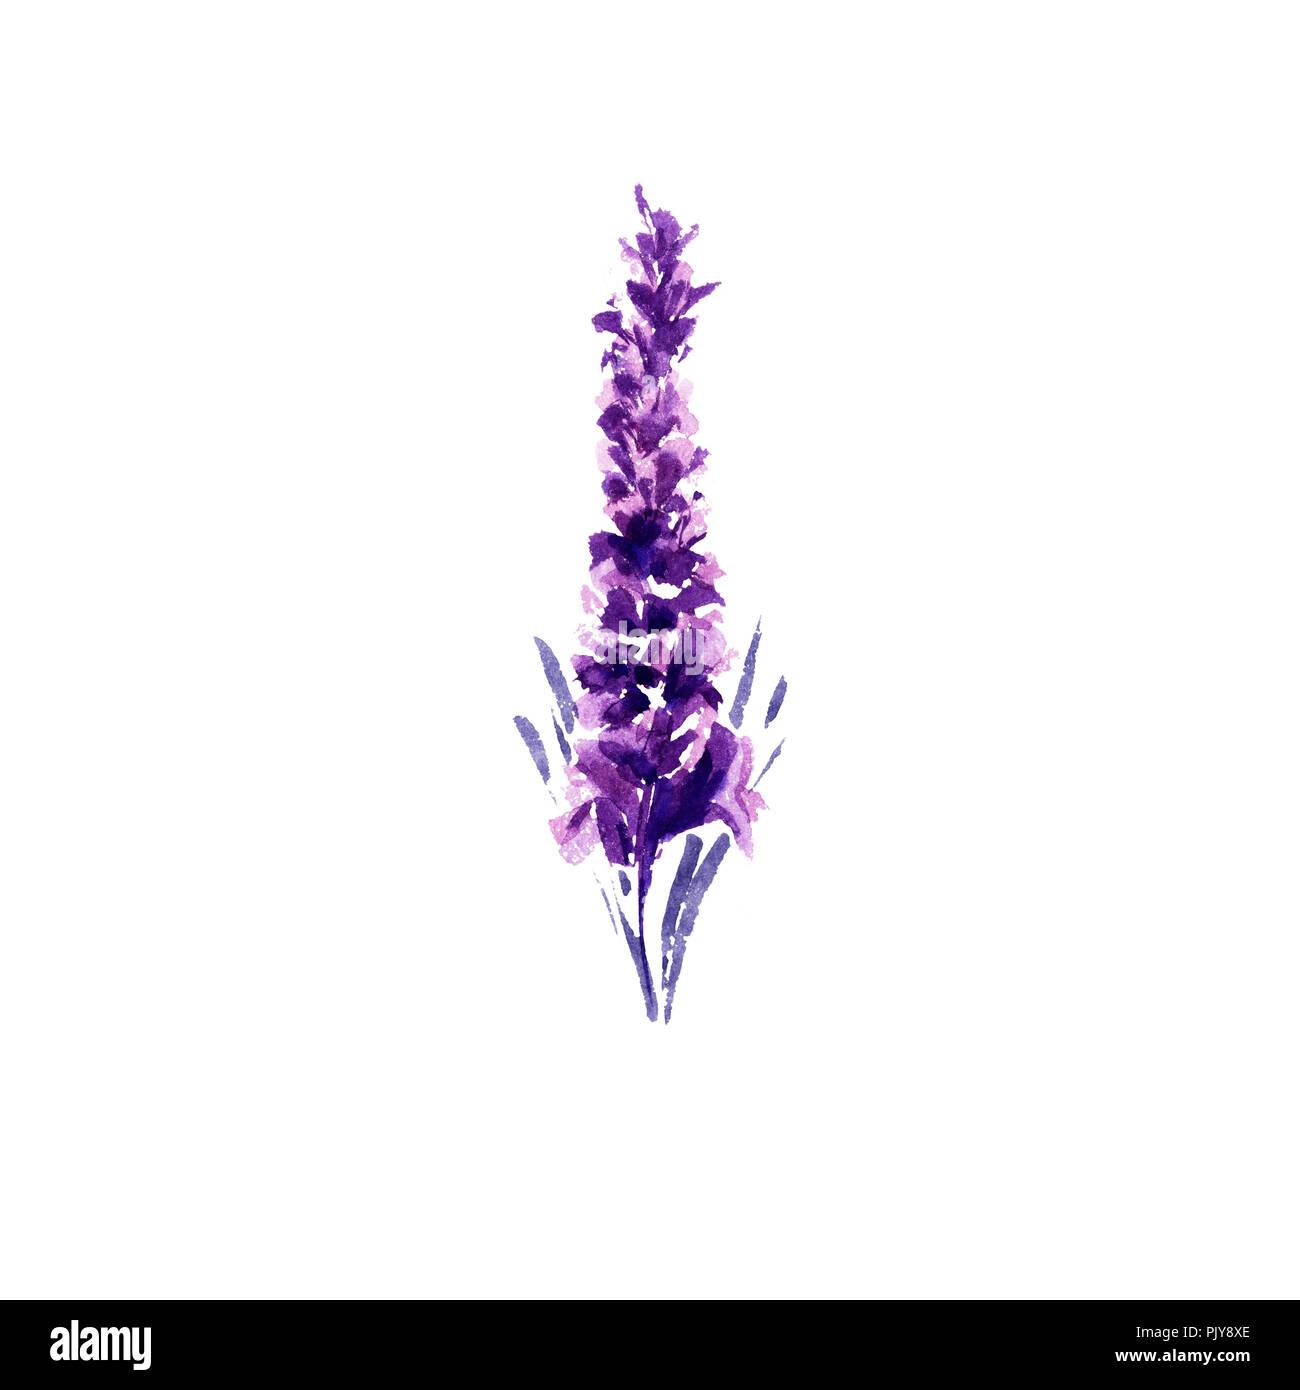 Lavendel Blume Aquarell Abbildung Single Lavendel Zweig Hochzeit